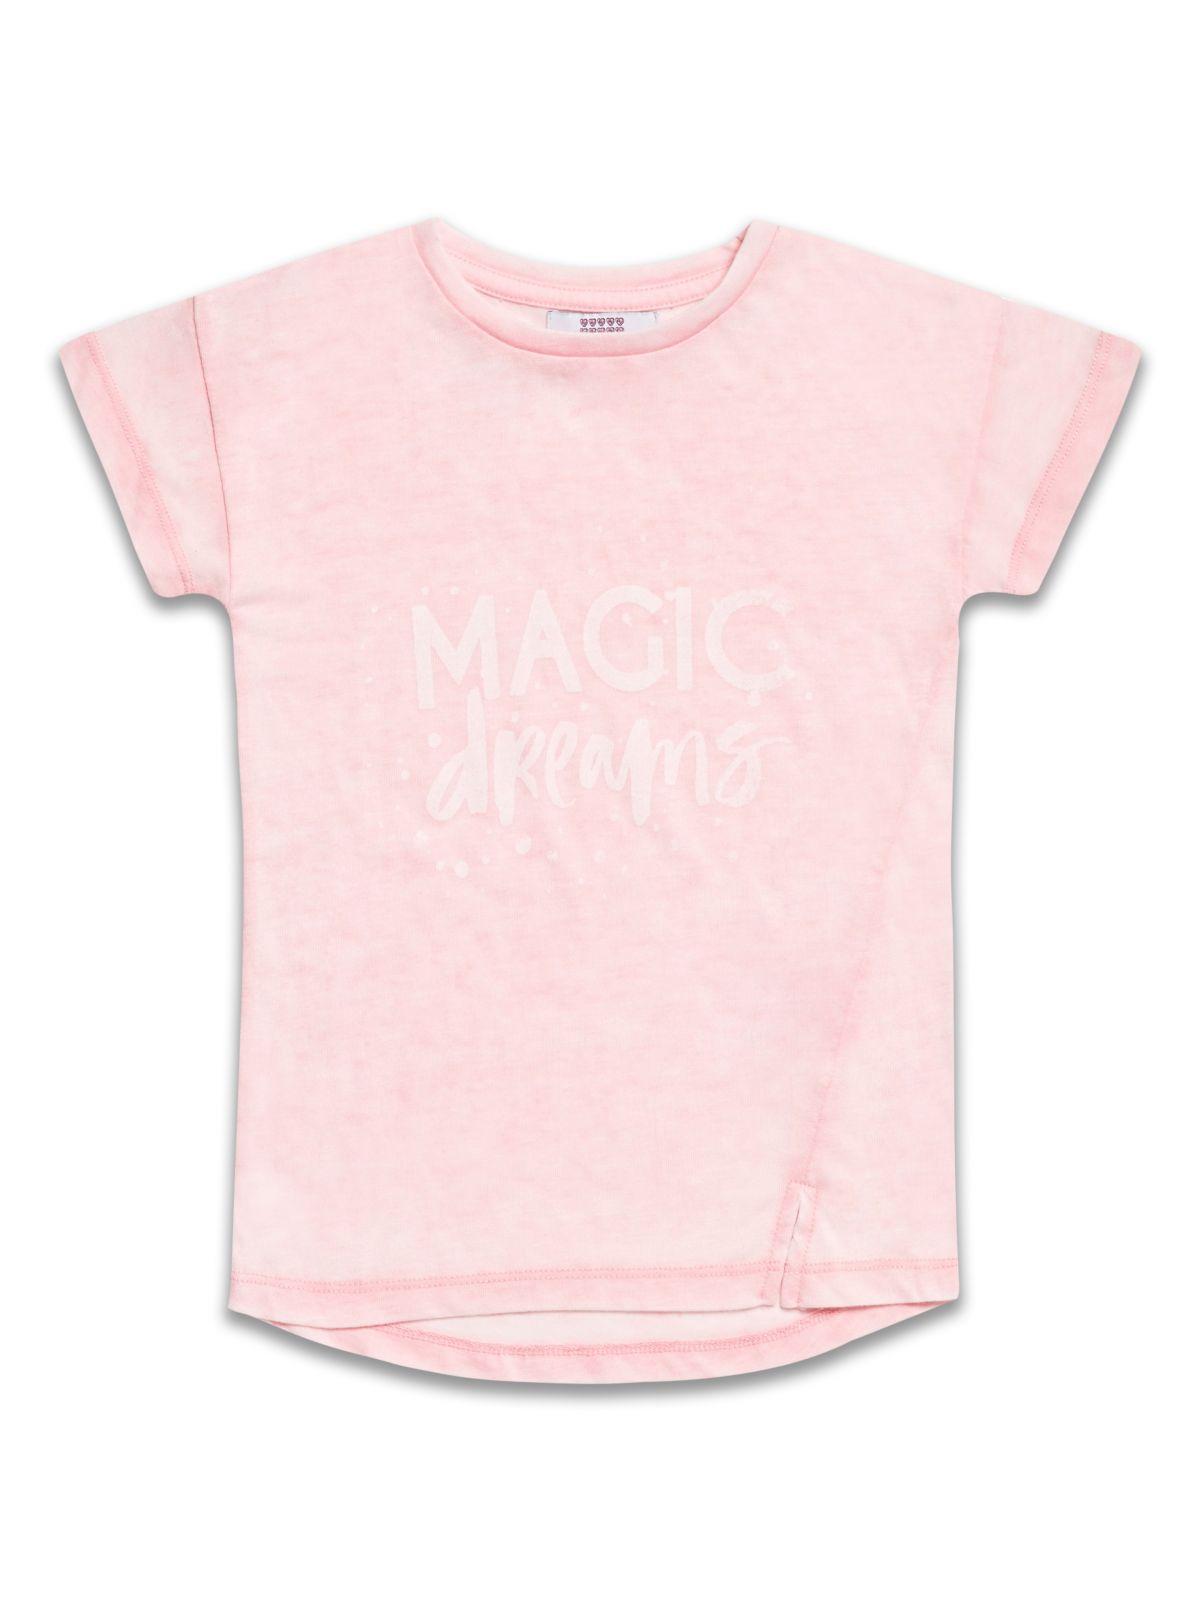 dětské tričko krátký rukáv, dívčí triko SUGAR SQUAD